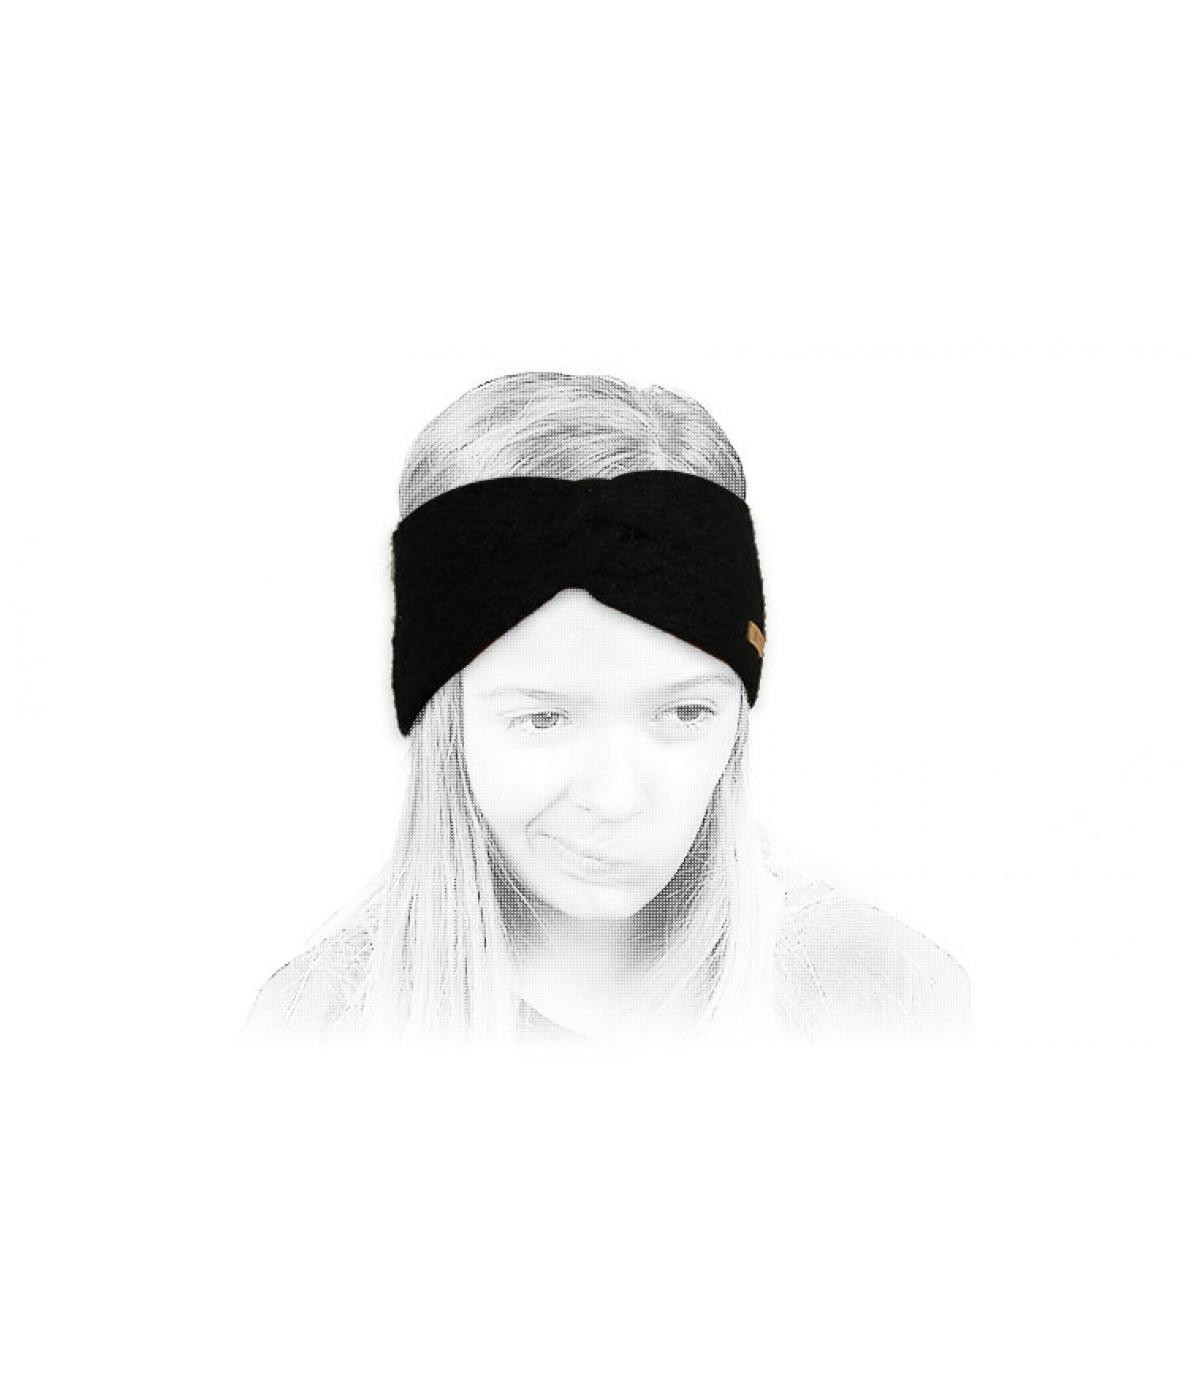 Details Kids Rozamond Headband black - Abbildung 4